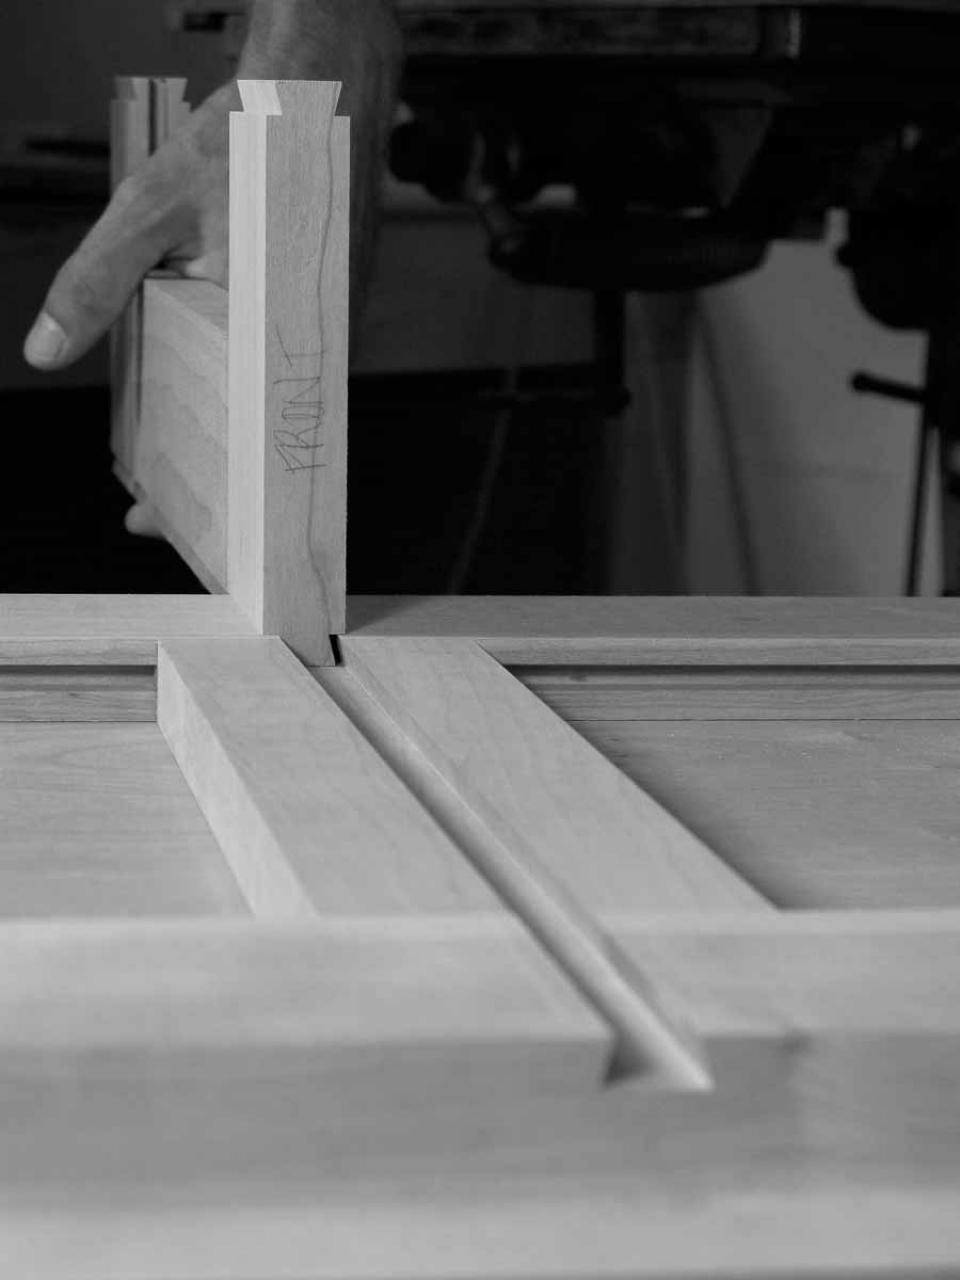 assembling a sliding dovetail joint